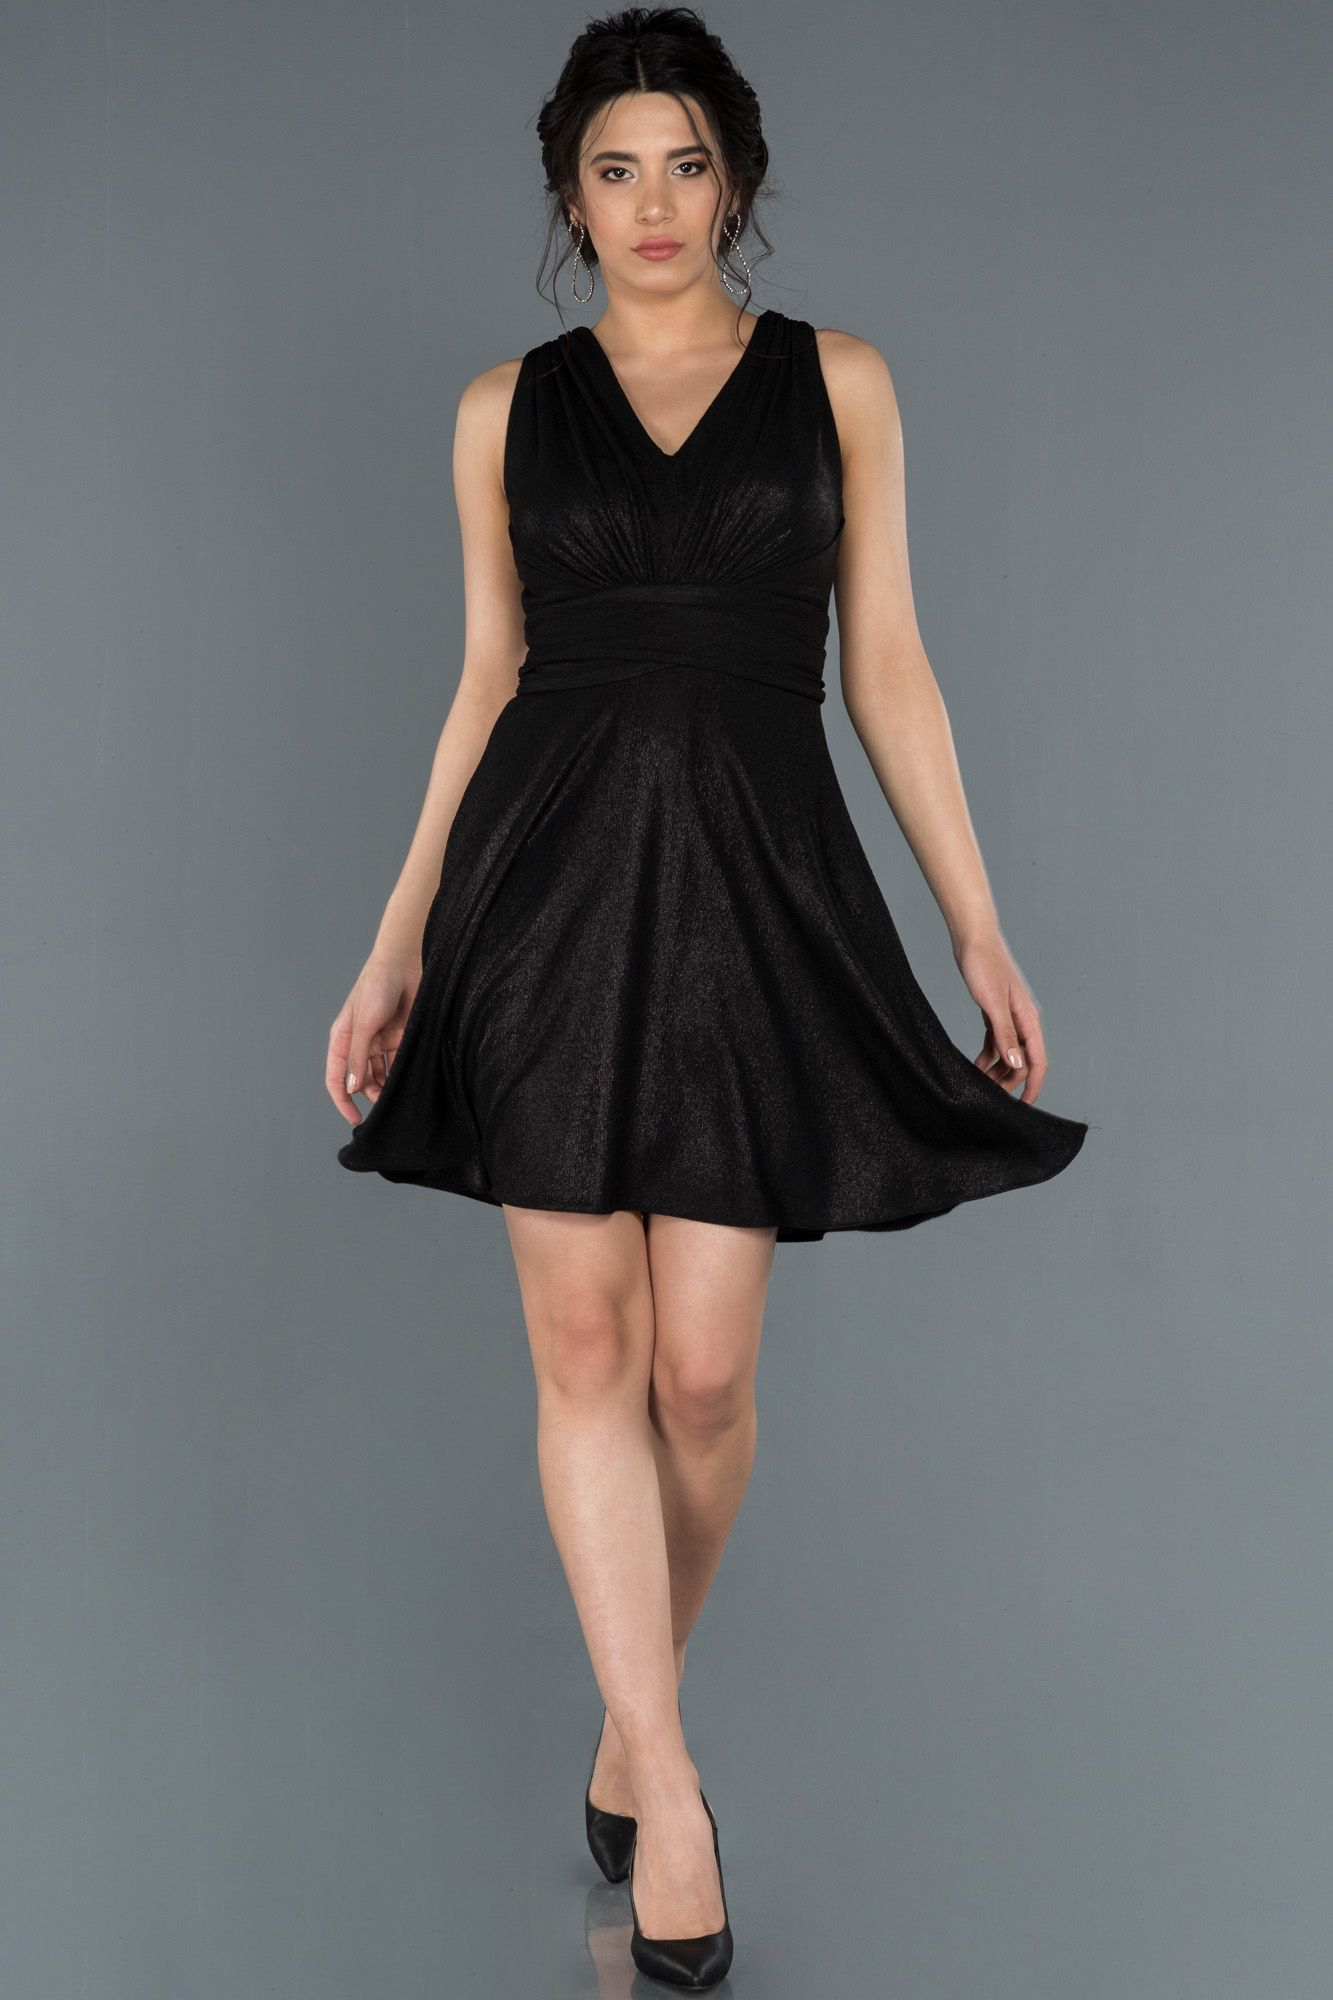 Siyah V Yaka Sirt Dekolteli Simli Abiye Abk786 2020 Moda Stilleri Elbise The Dress